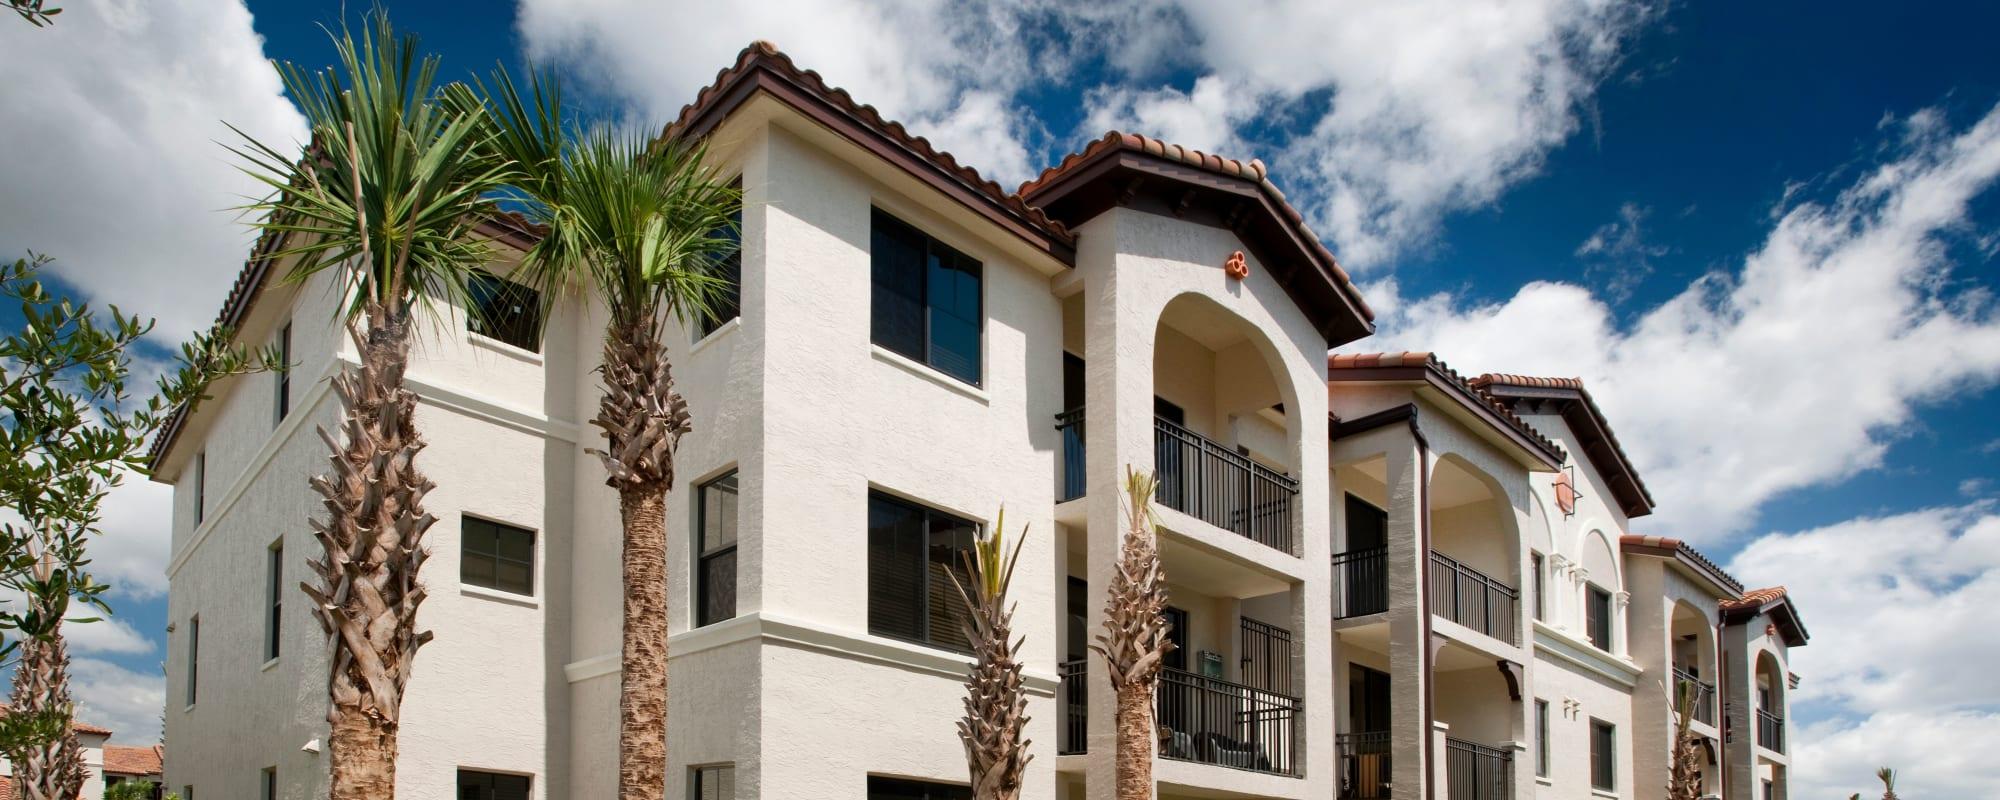 Apartments at Doral View Apartments in Miami, Florida